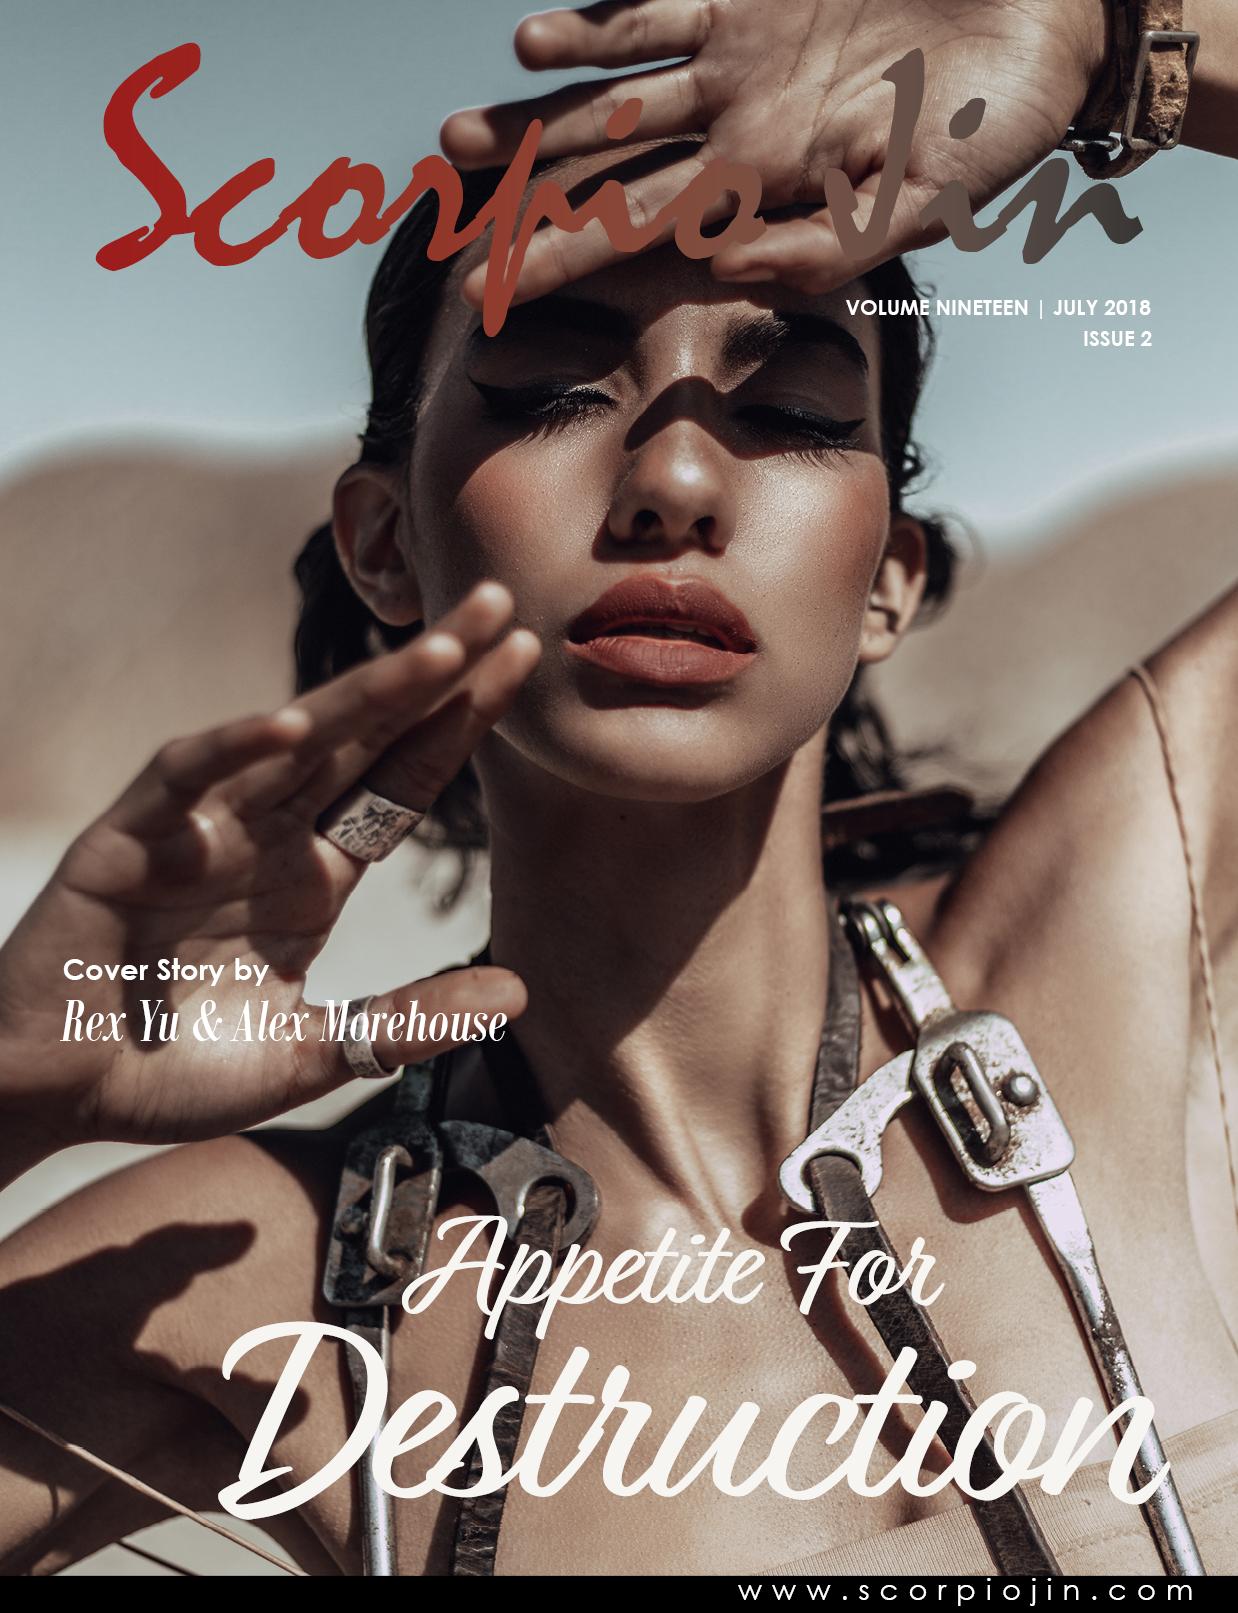 Scorpio Jin Magazine Volume NINETEEN_B_APPETITE FOR DESTRUCTION.png